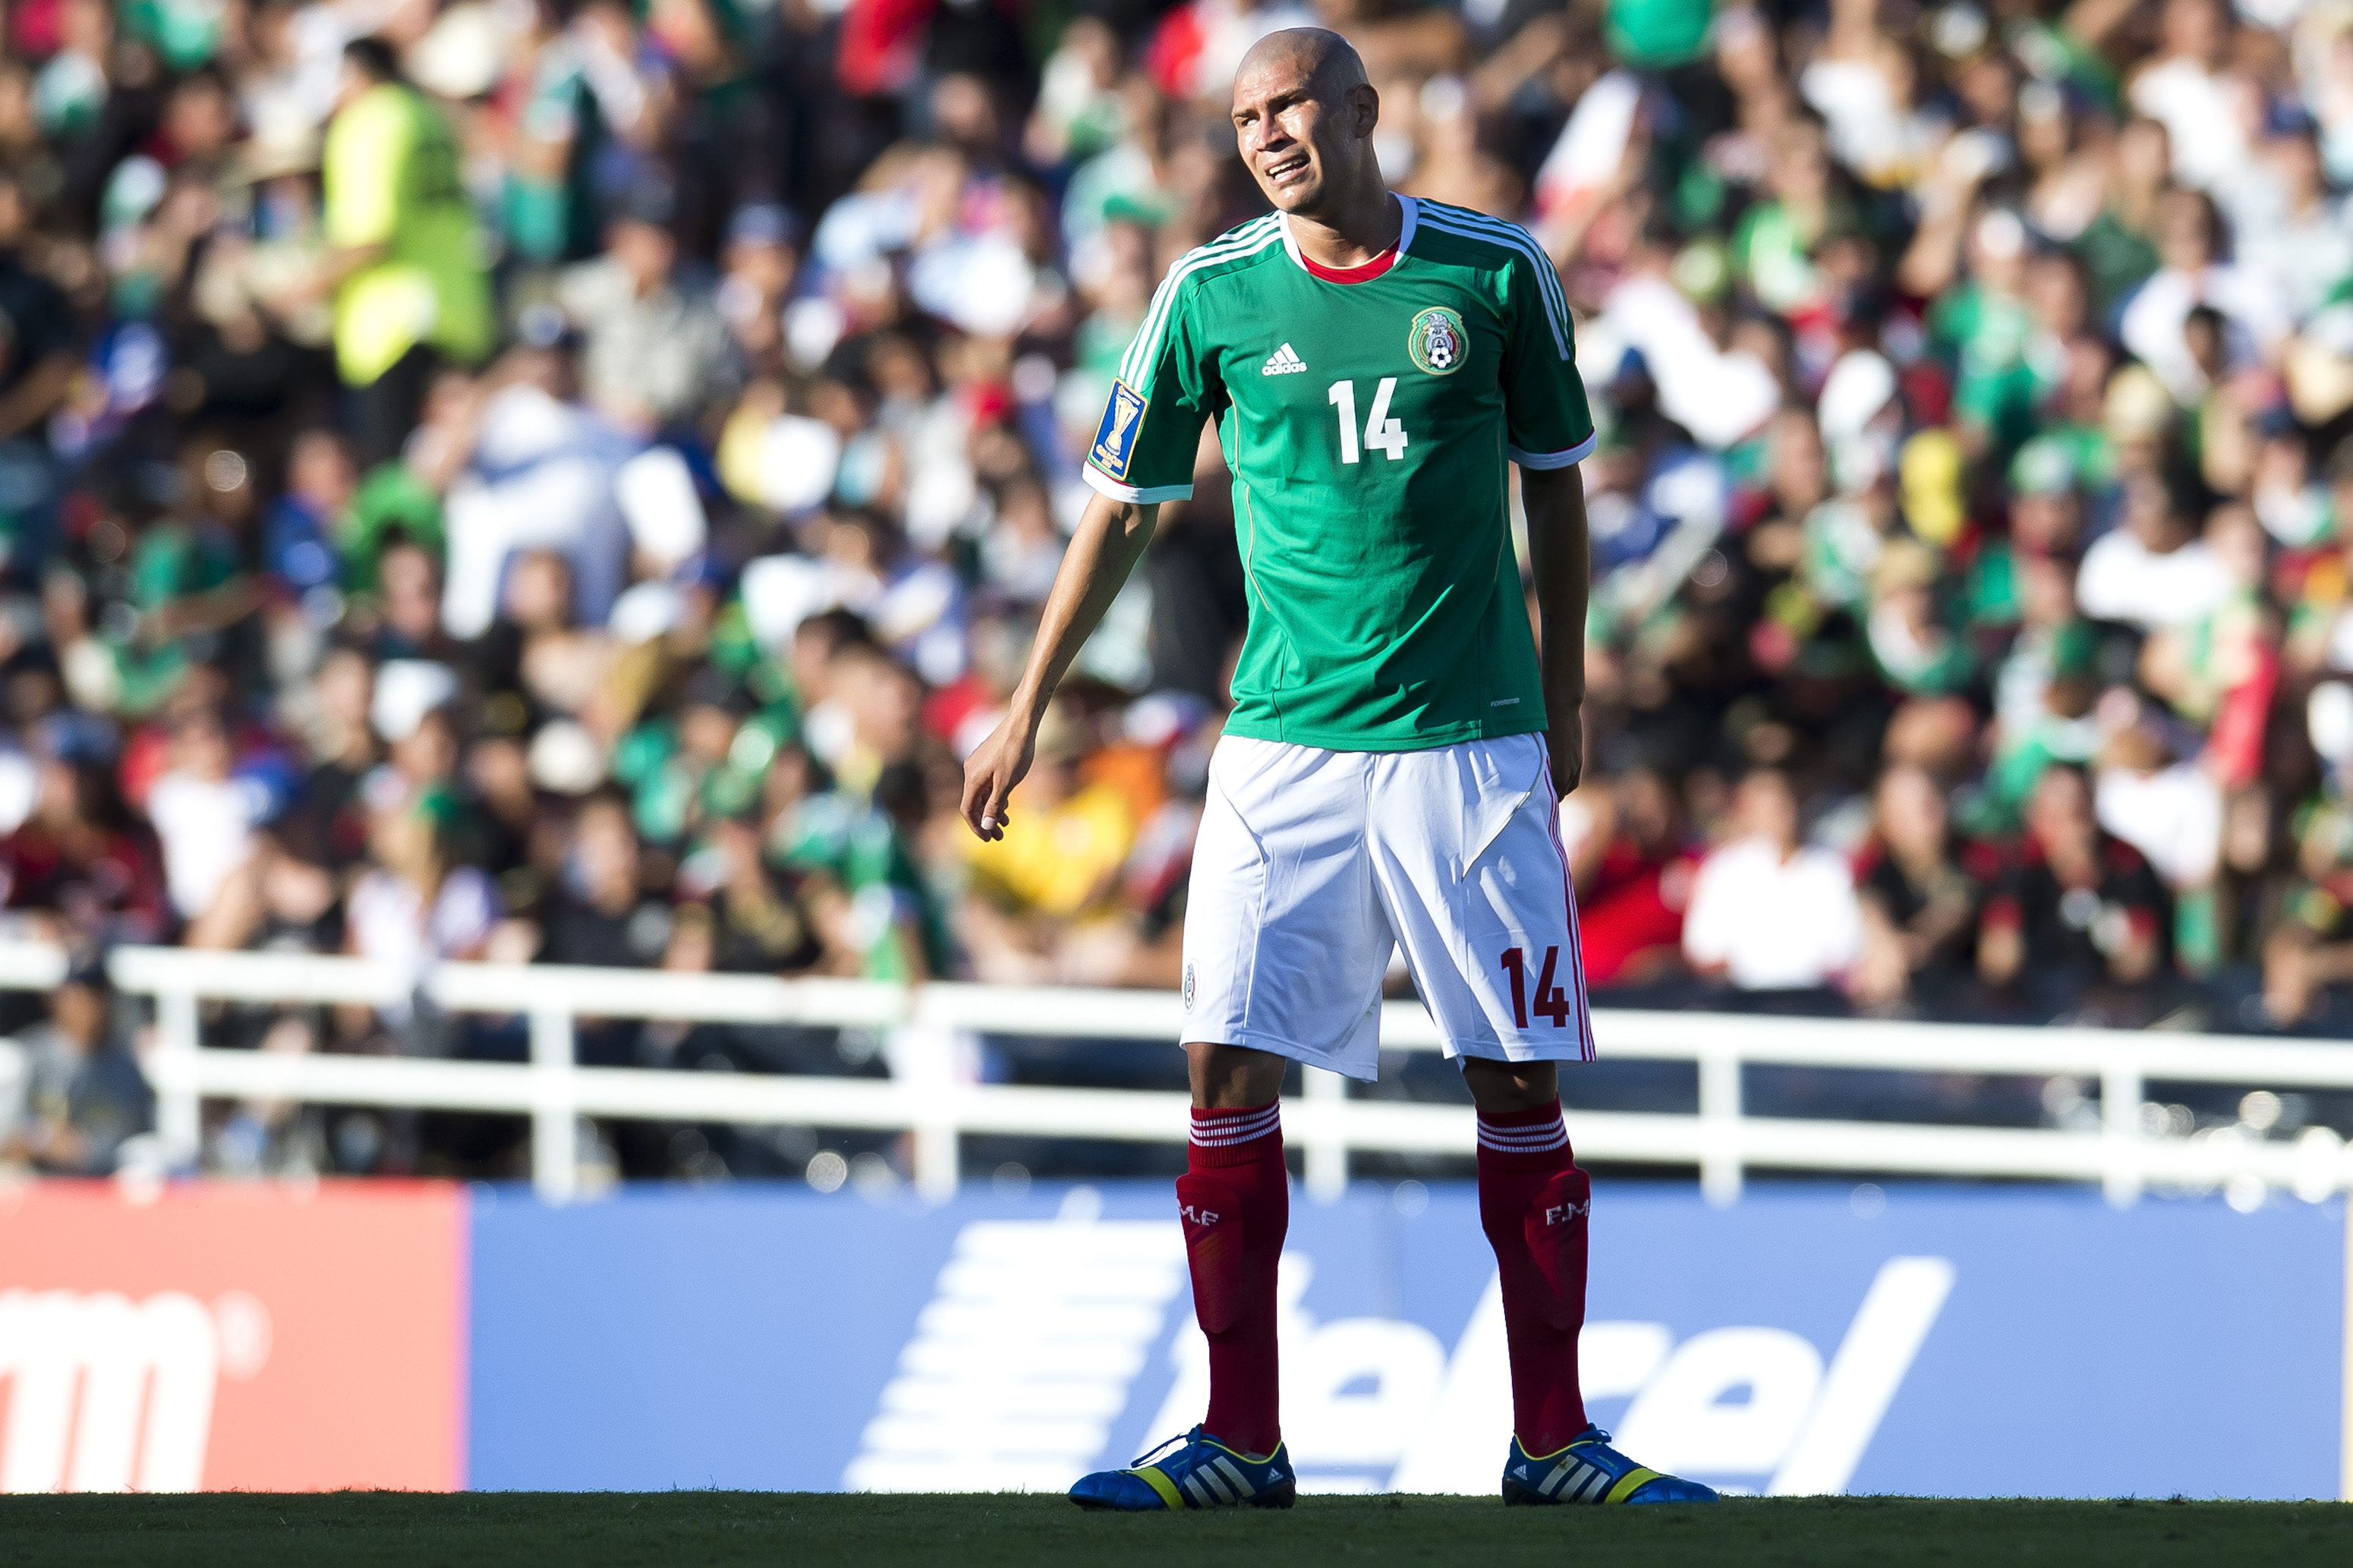 Https Www Tudn Com Futbol Liga Mx Apertura Monterrey Vs Cruz Azul